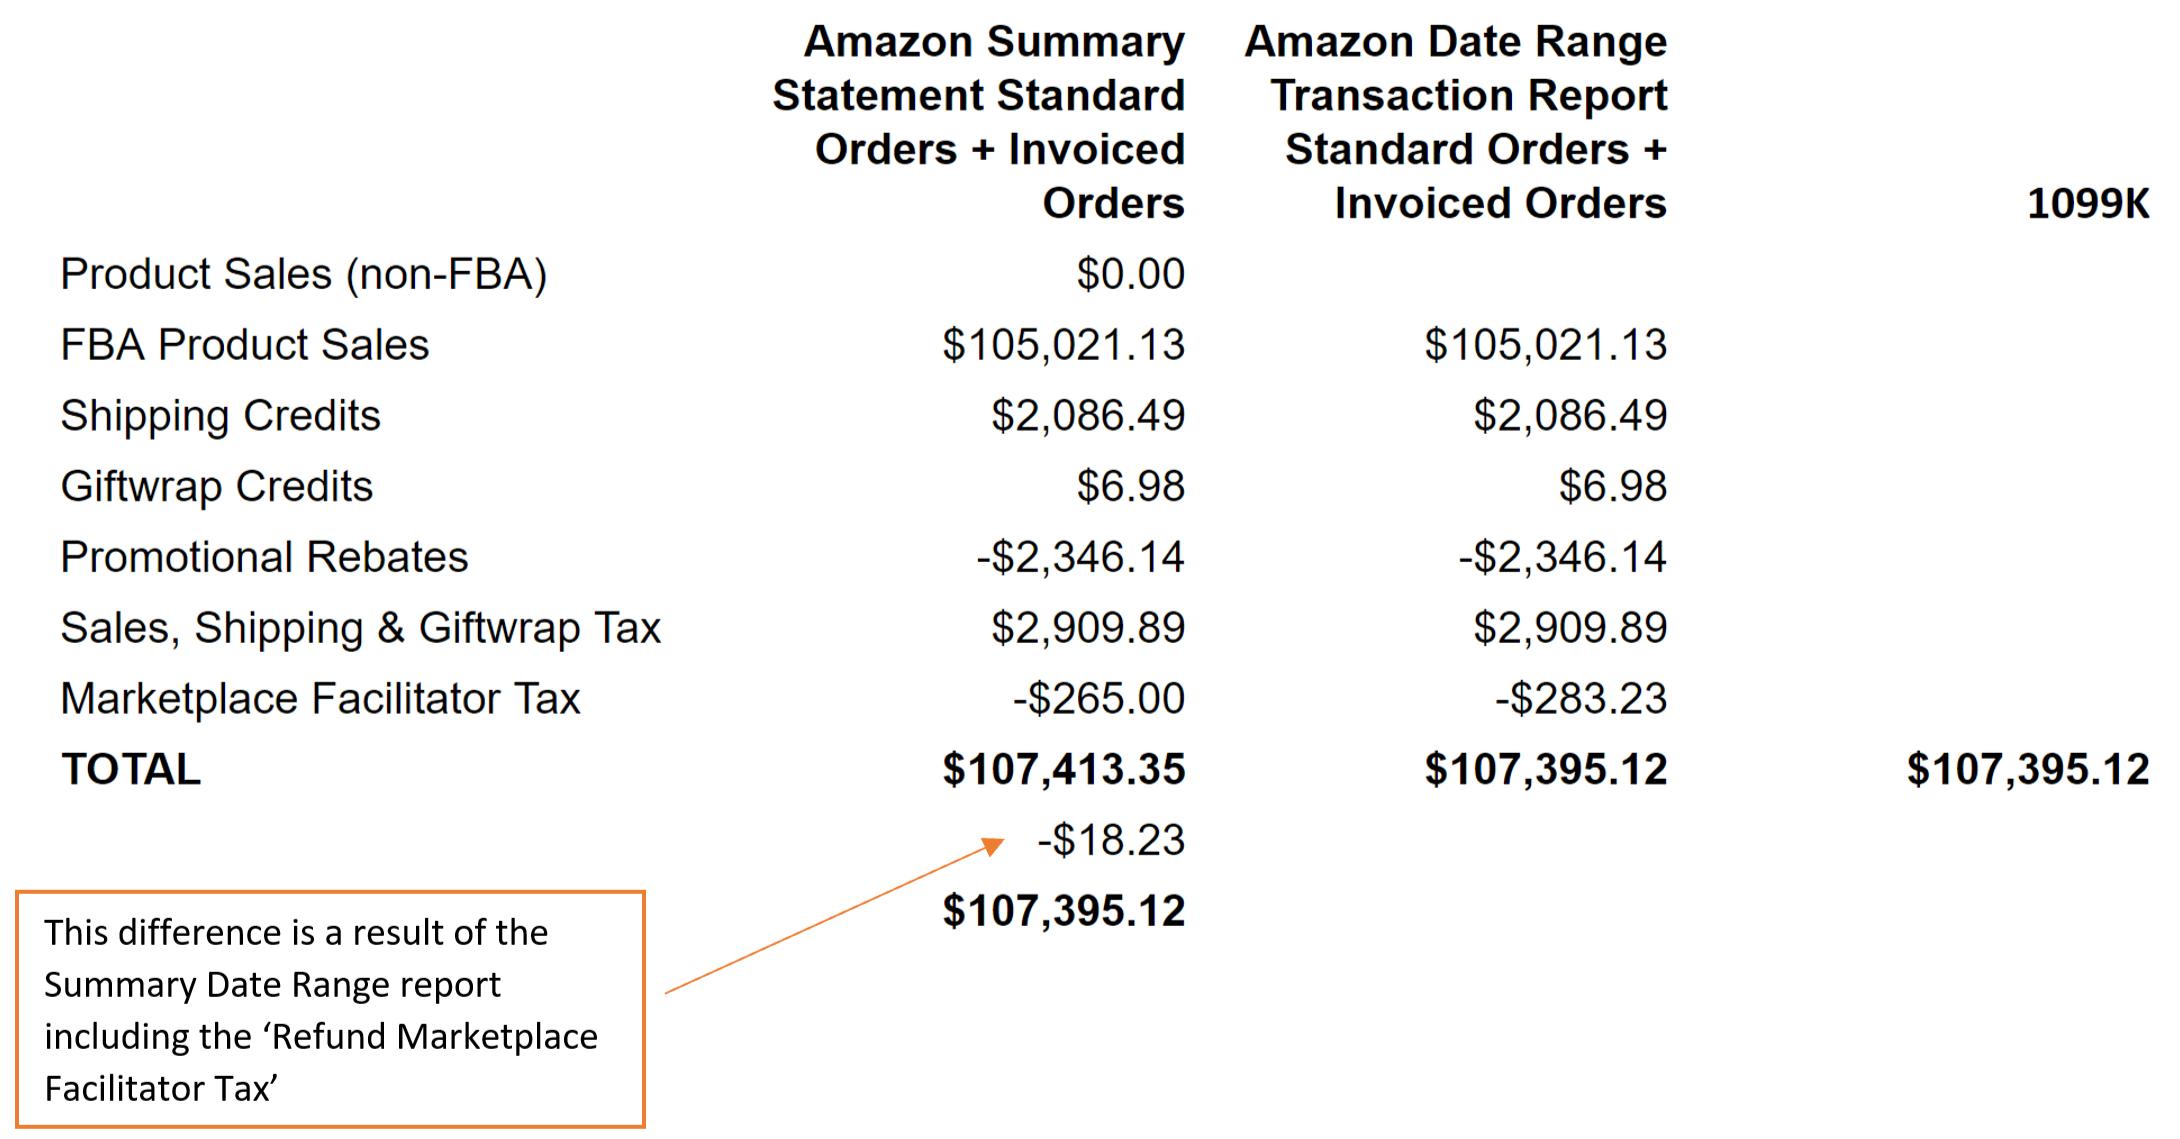 Amazon Summary Report